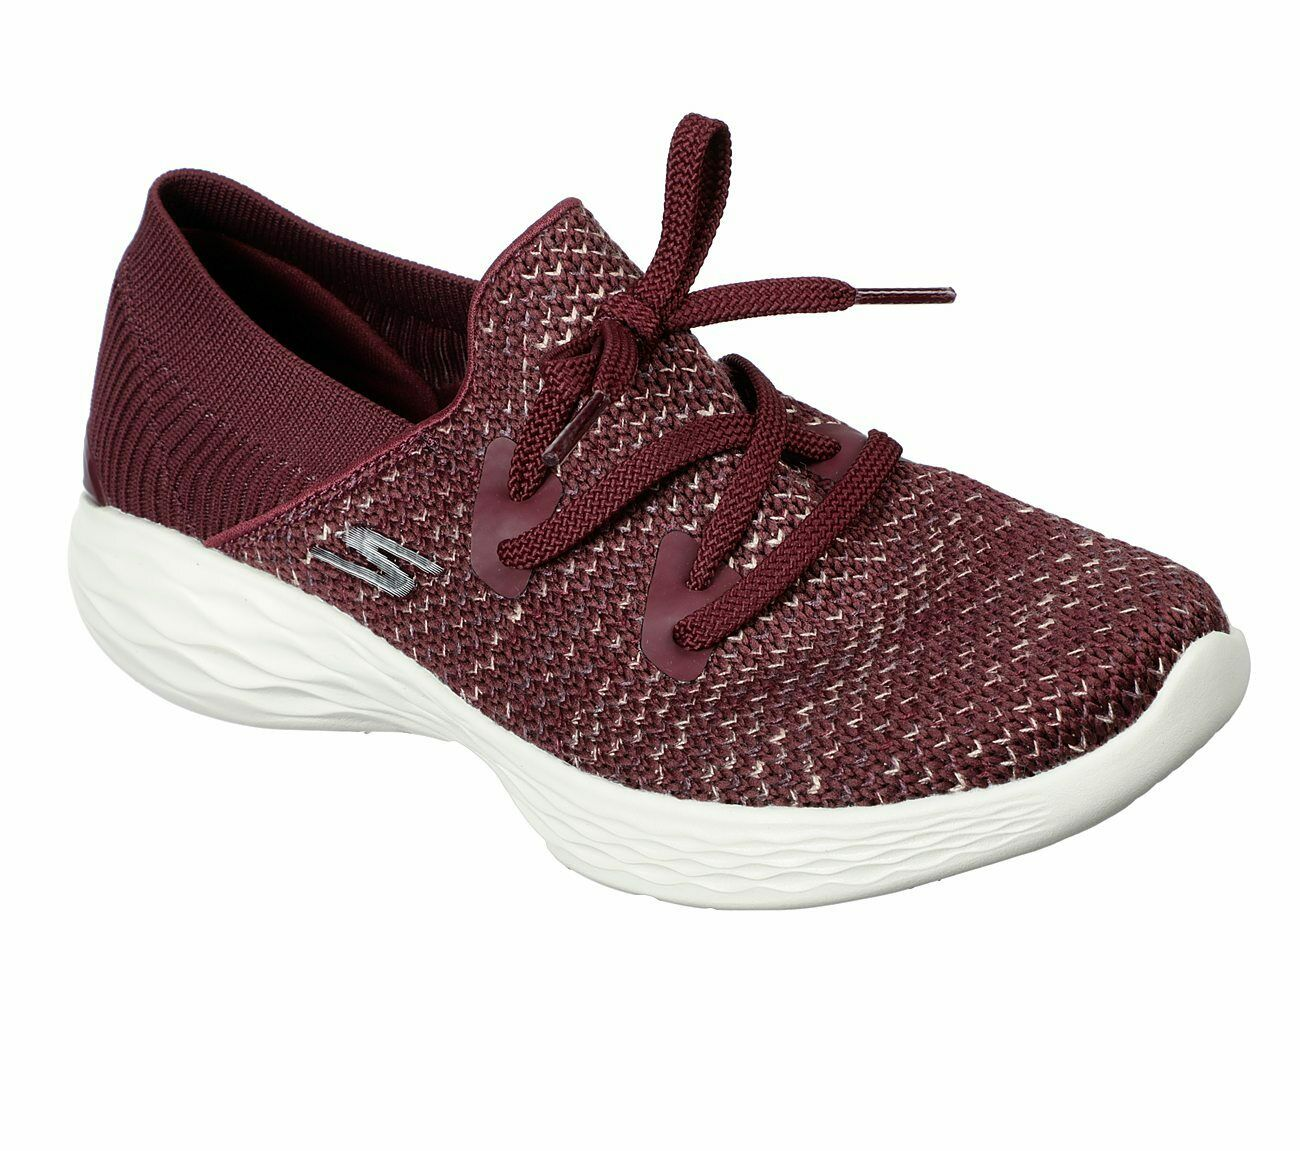 NEU SKECHERS Damen Sneakers Turnschuhe Sport Walking YOU - PROMINENCE Rot